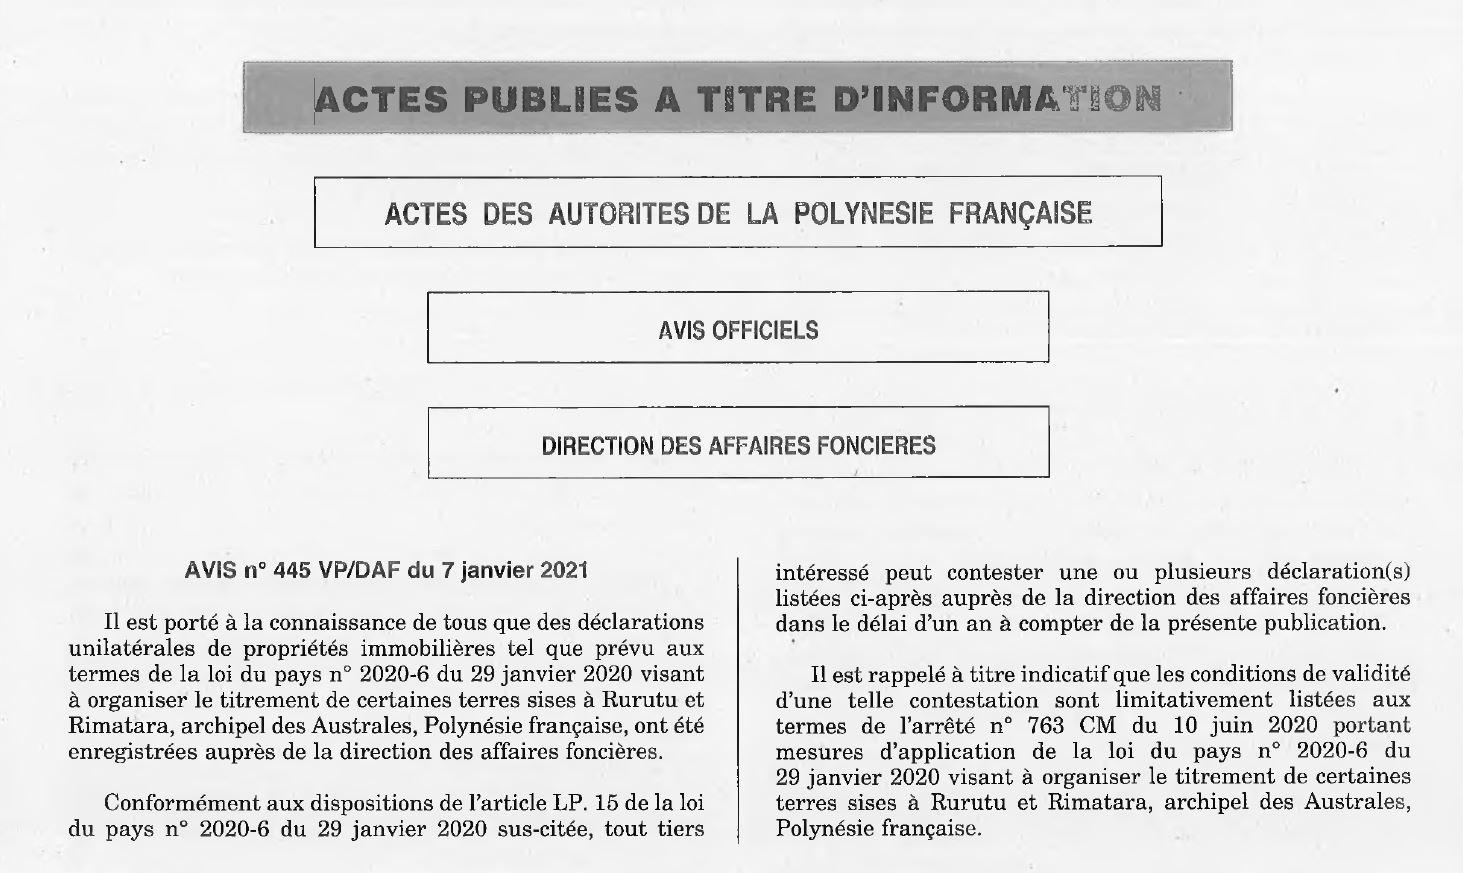 AVIS N°445 VP/DAF (7 janvier 2021)